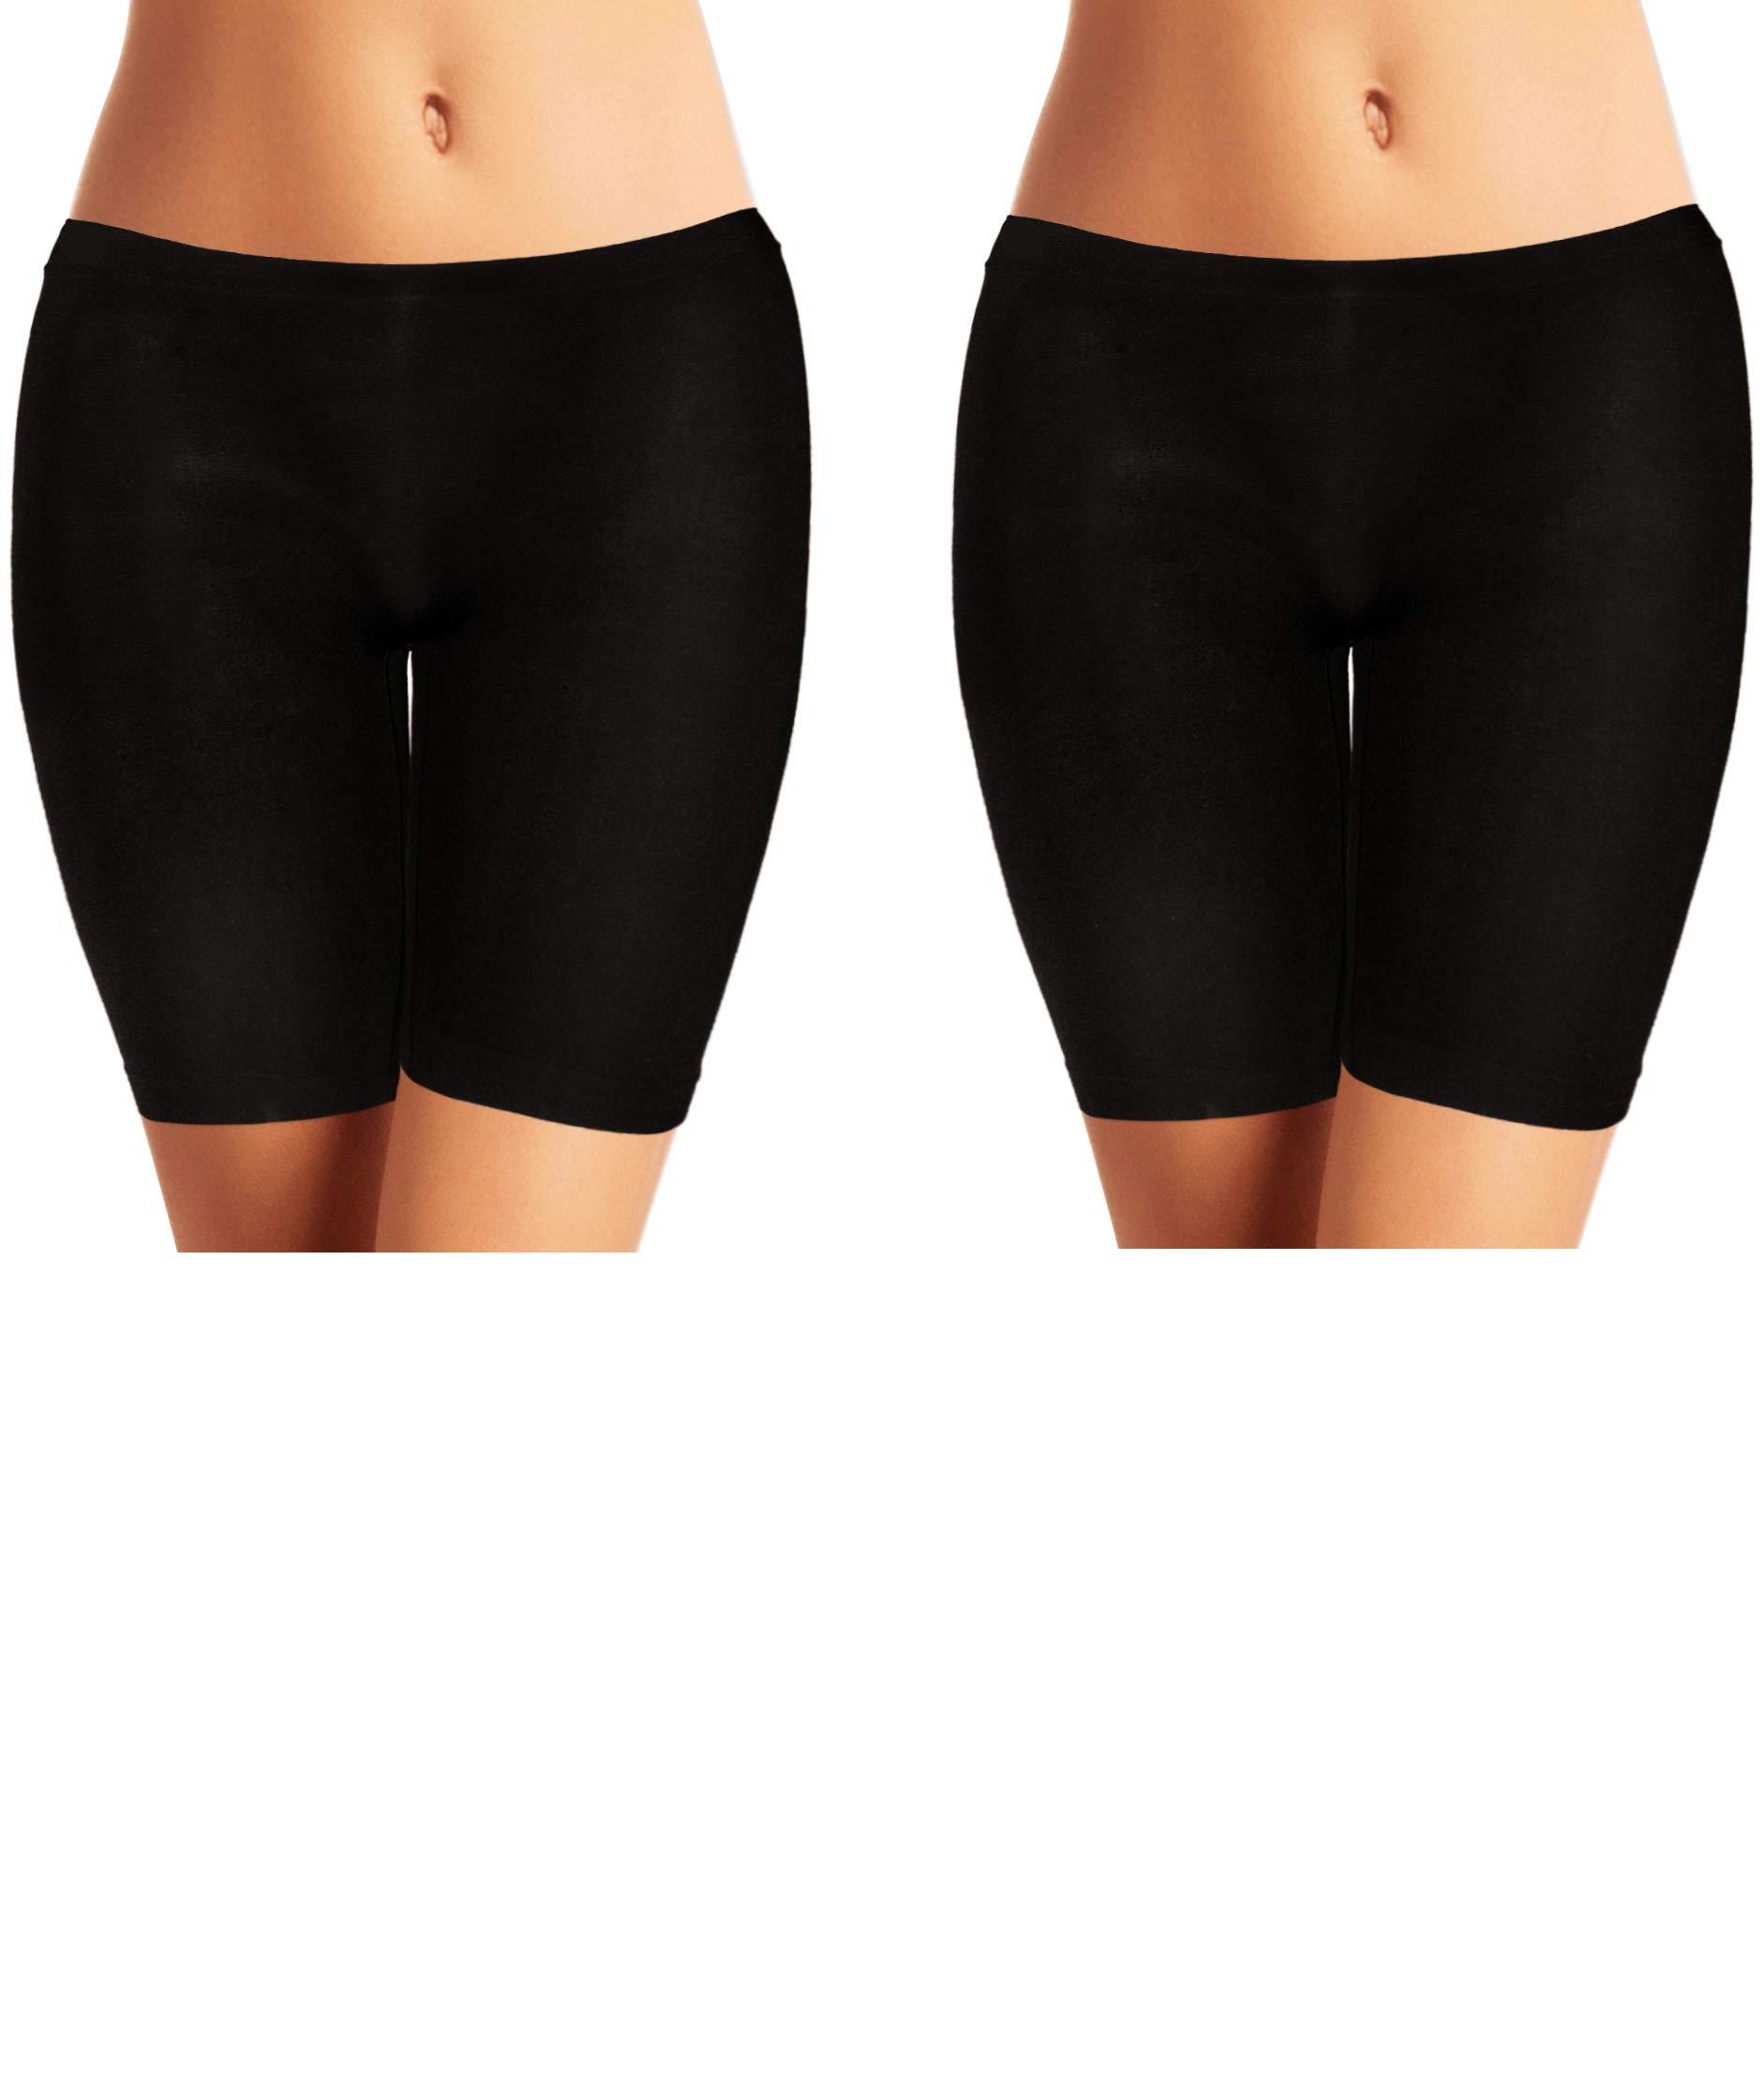 Emprella Biker Shorts Women, 2 Pack Bike Shorts, Spandex Slip Shorts Yoga Gym